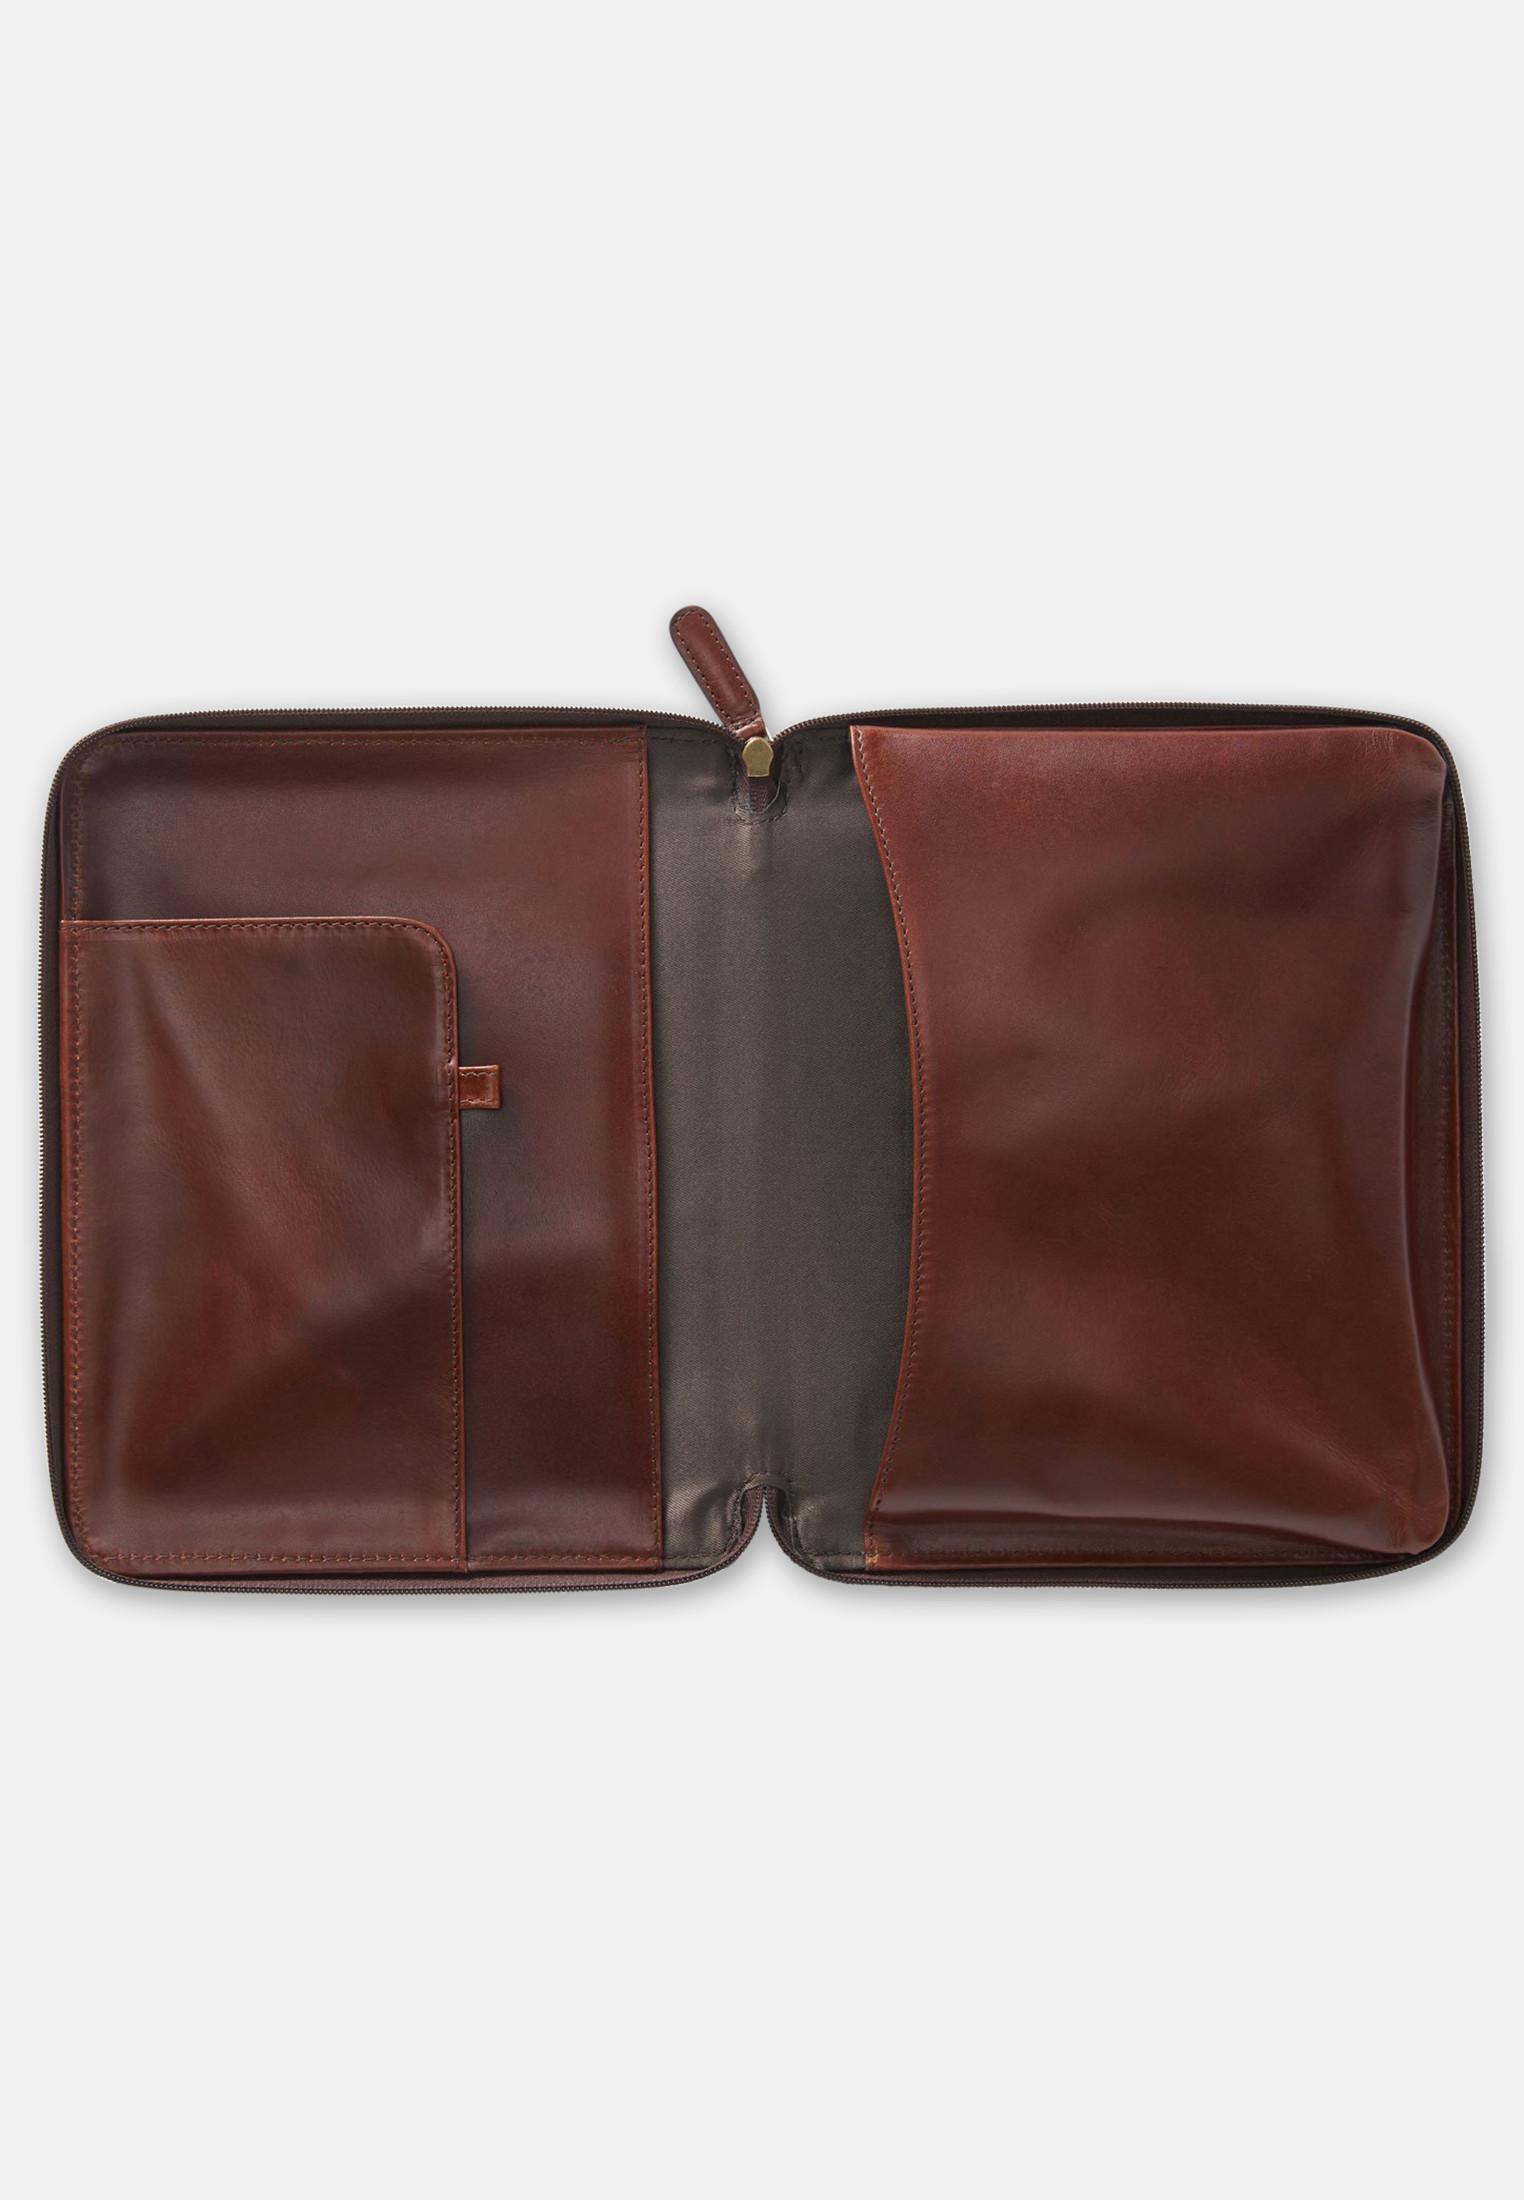 Haincliffe Tweed Tablet Holder